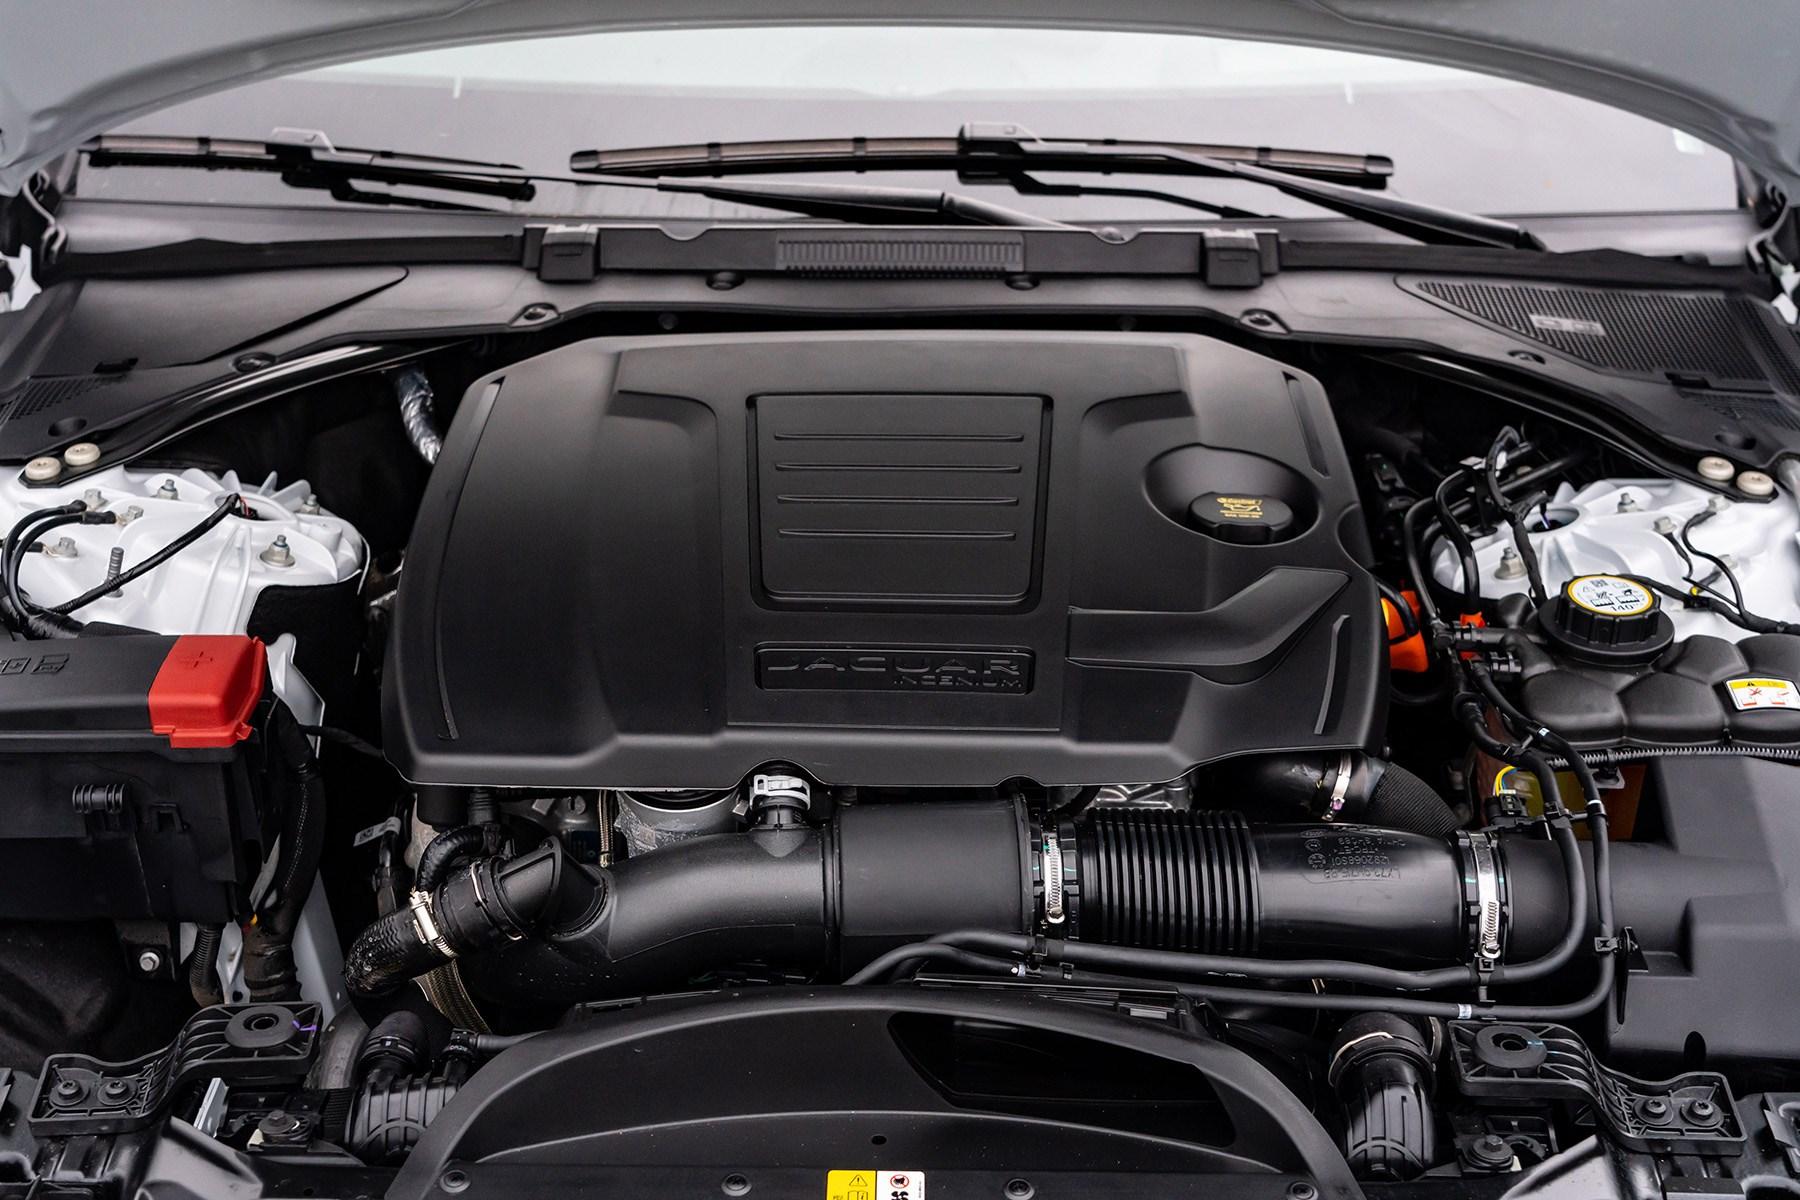 Jaguar XF 2021 facelift P300 engine